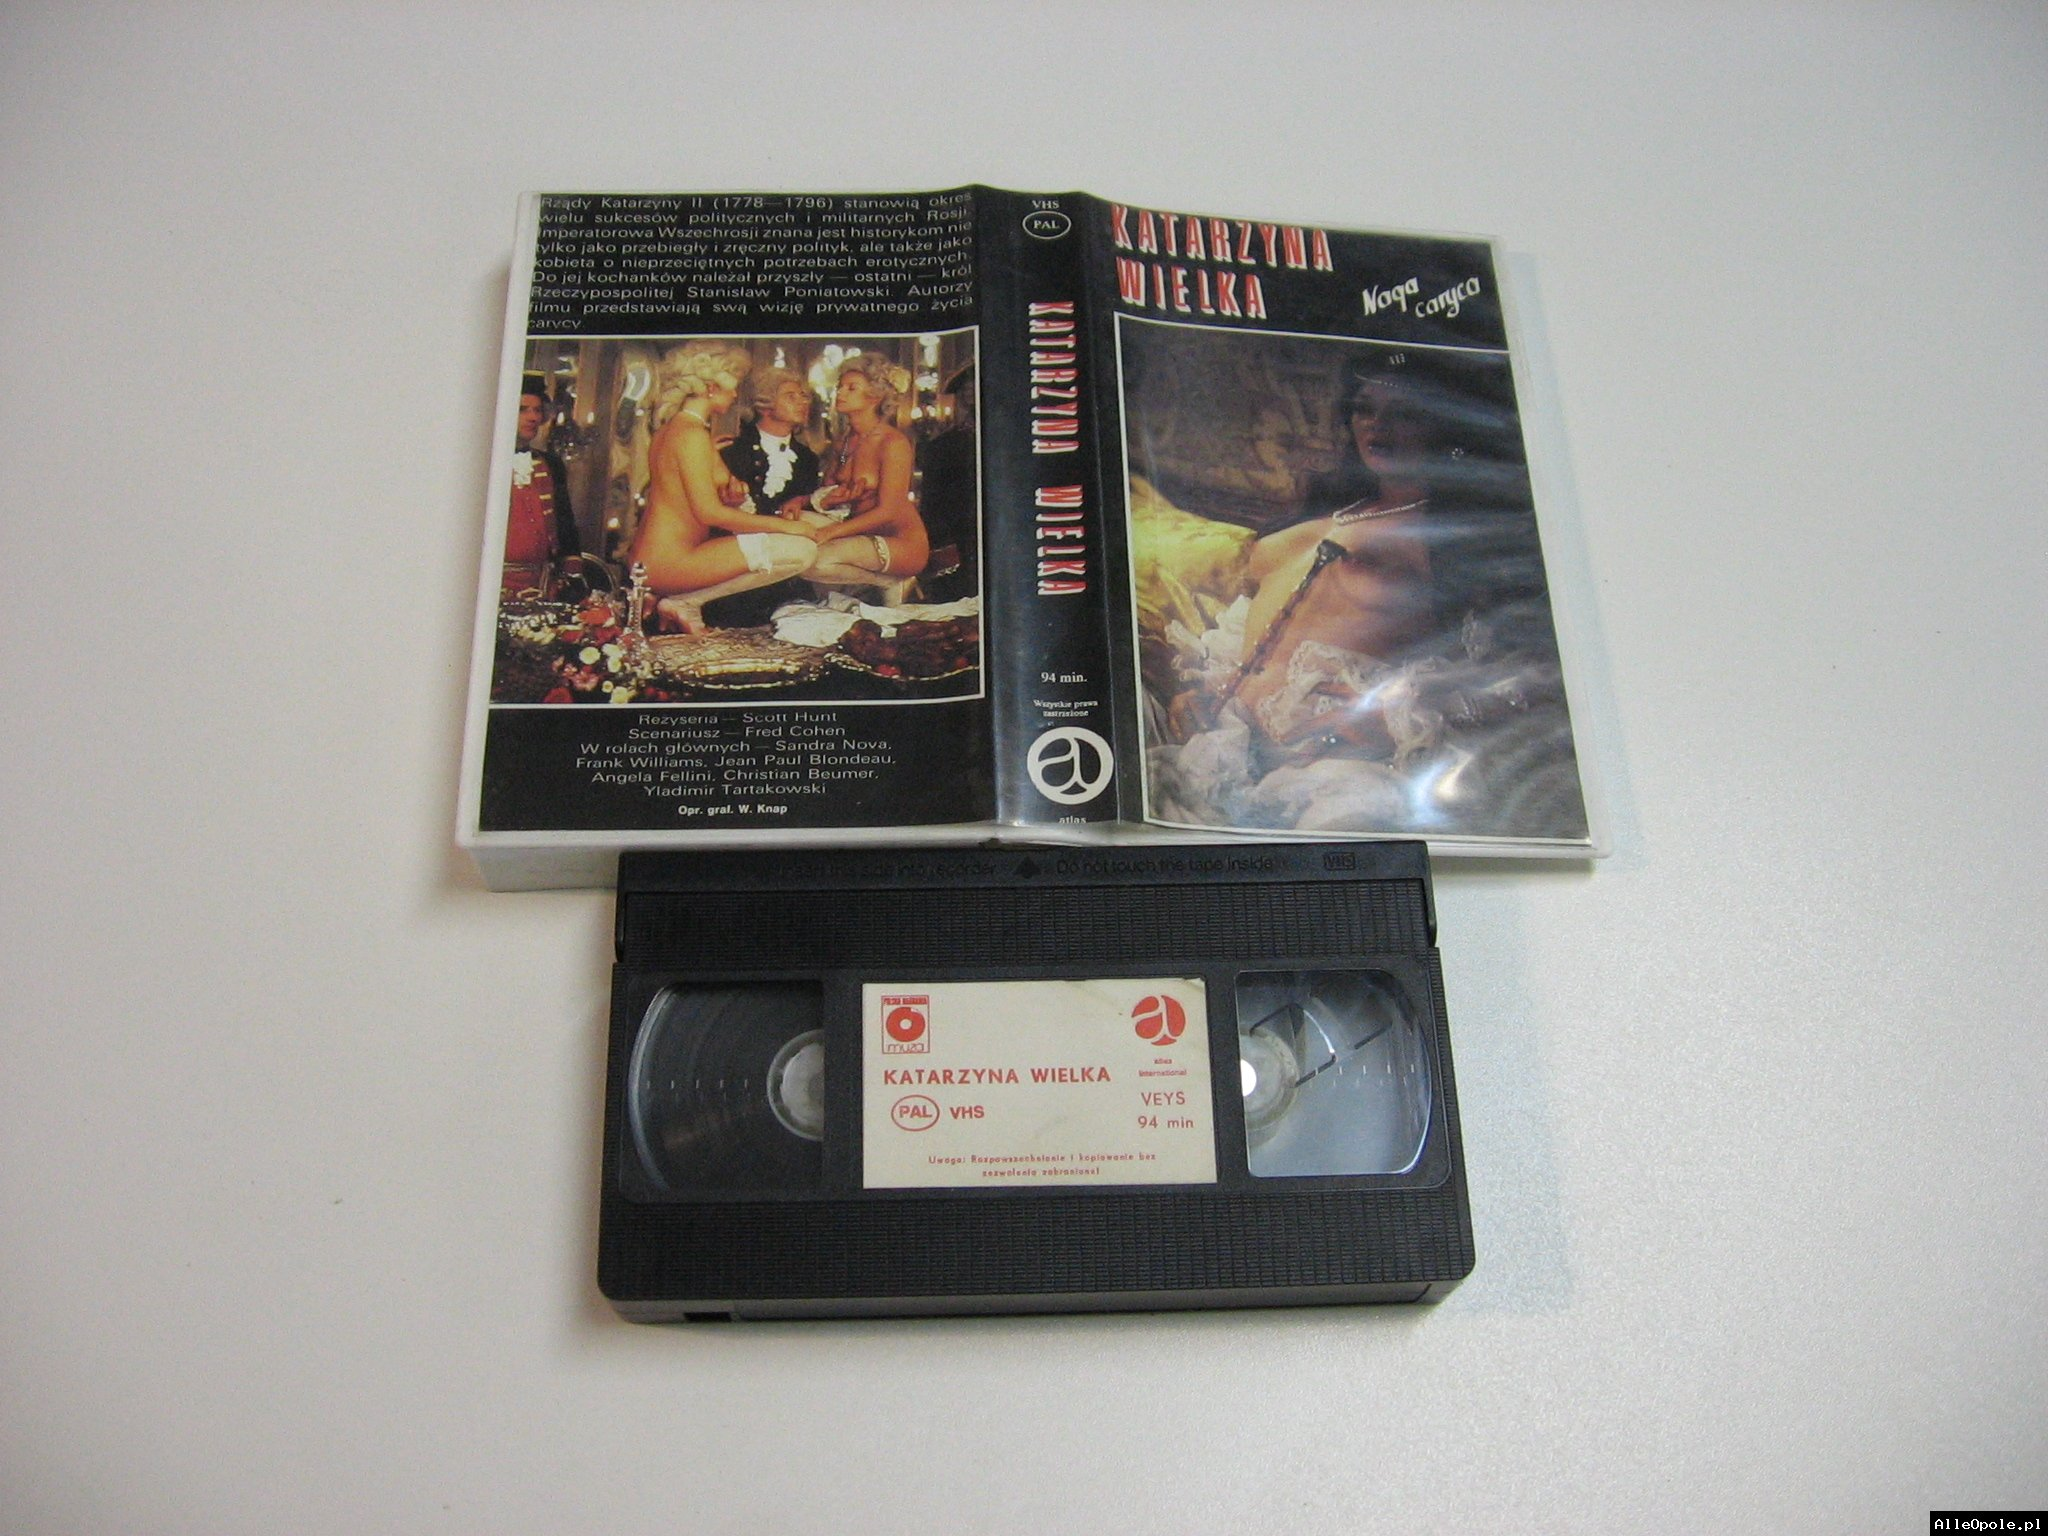 Katarzyna Wielka - Naga Caryca - VHS Kaseta Video - Opole 1835